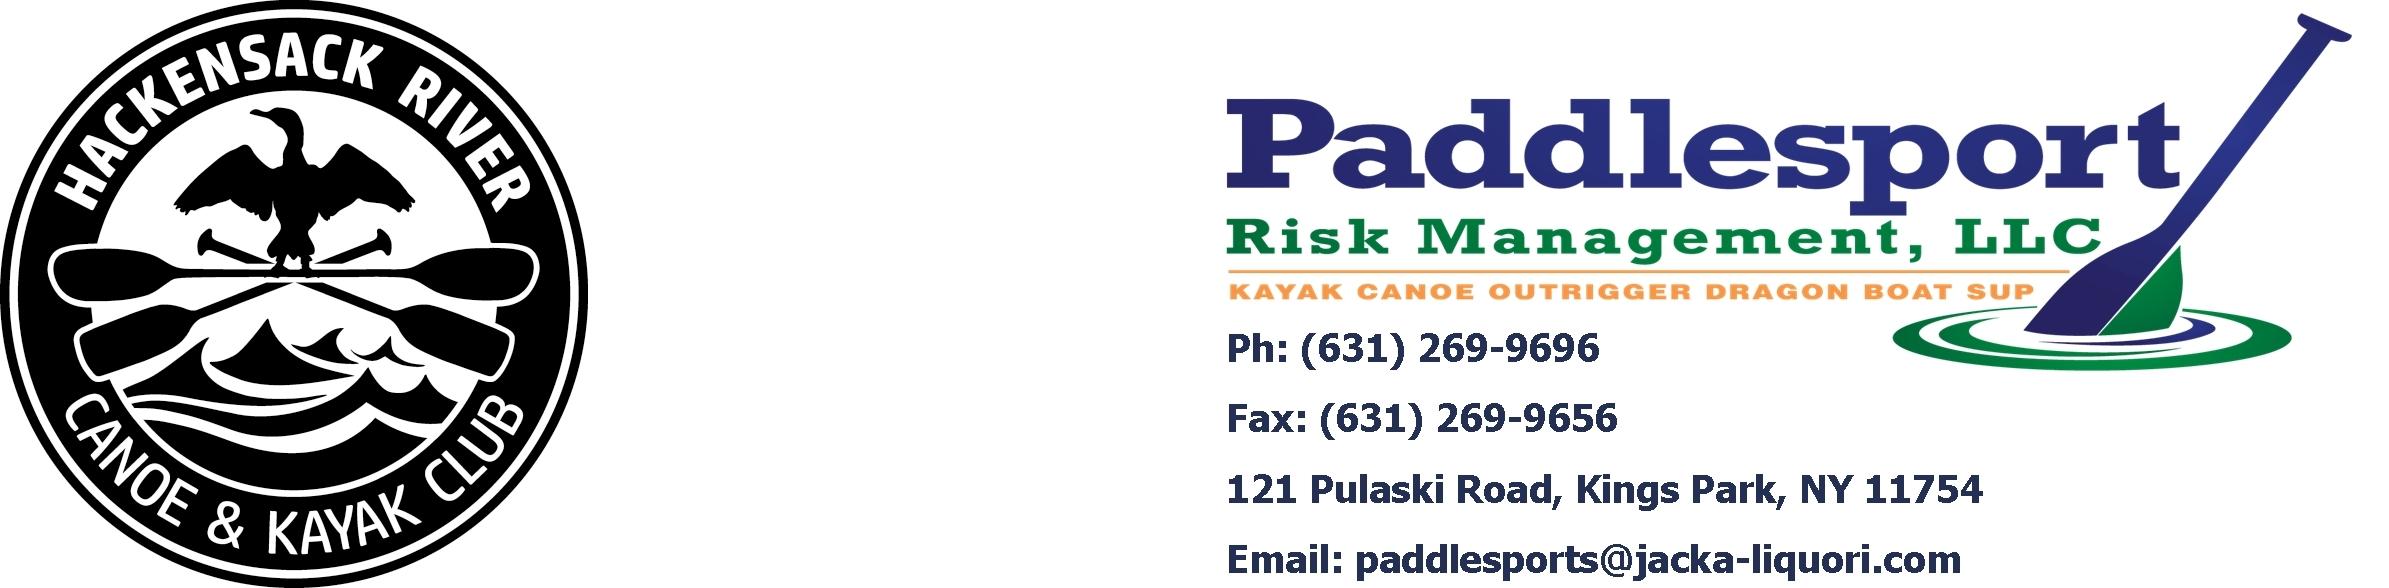 Paddlesport Risk Management, LLC